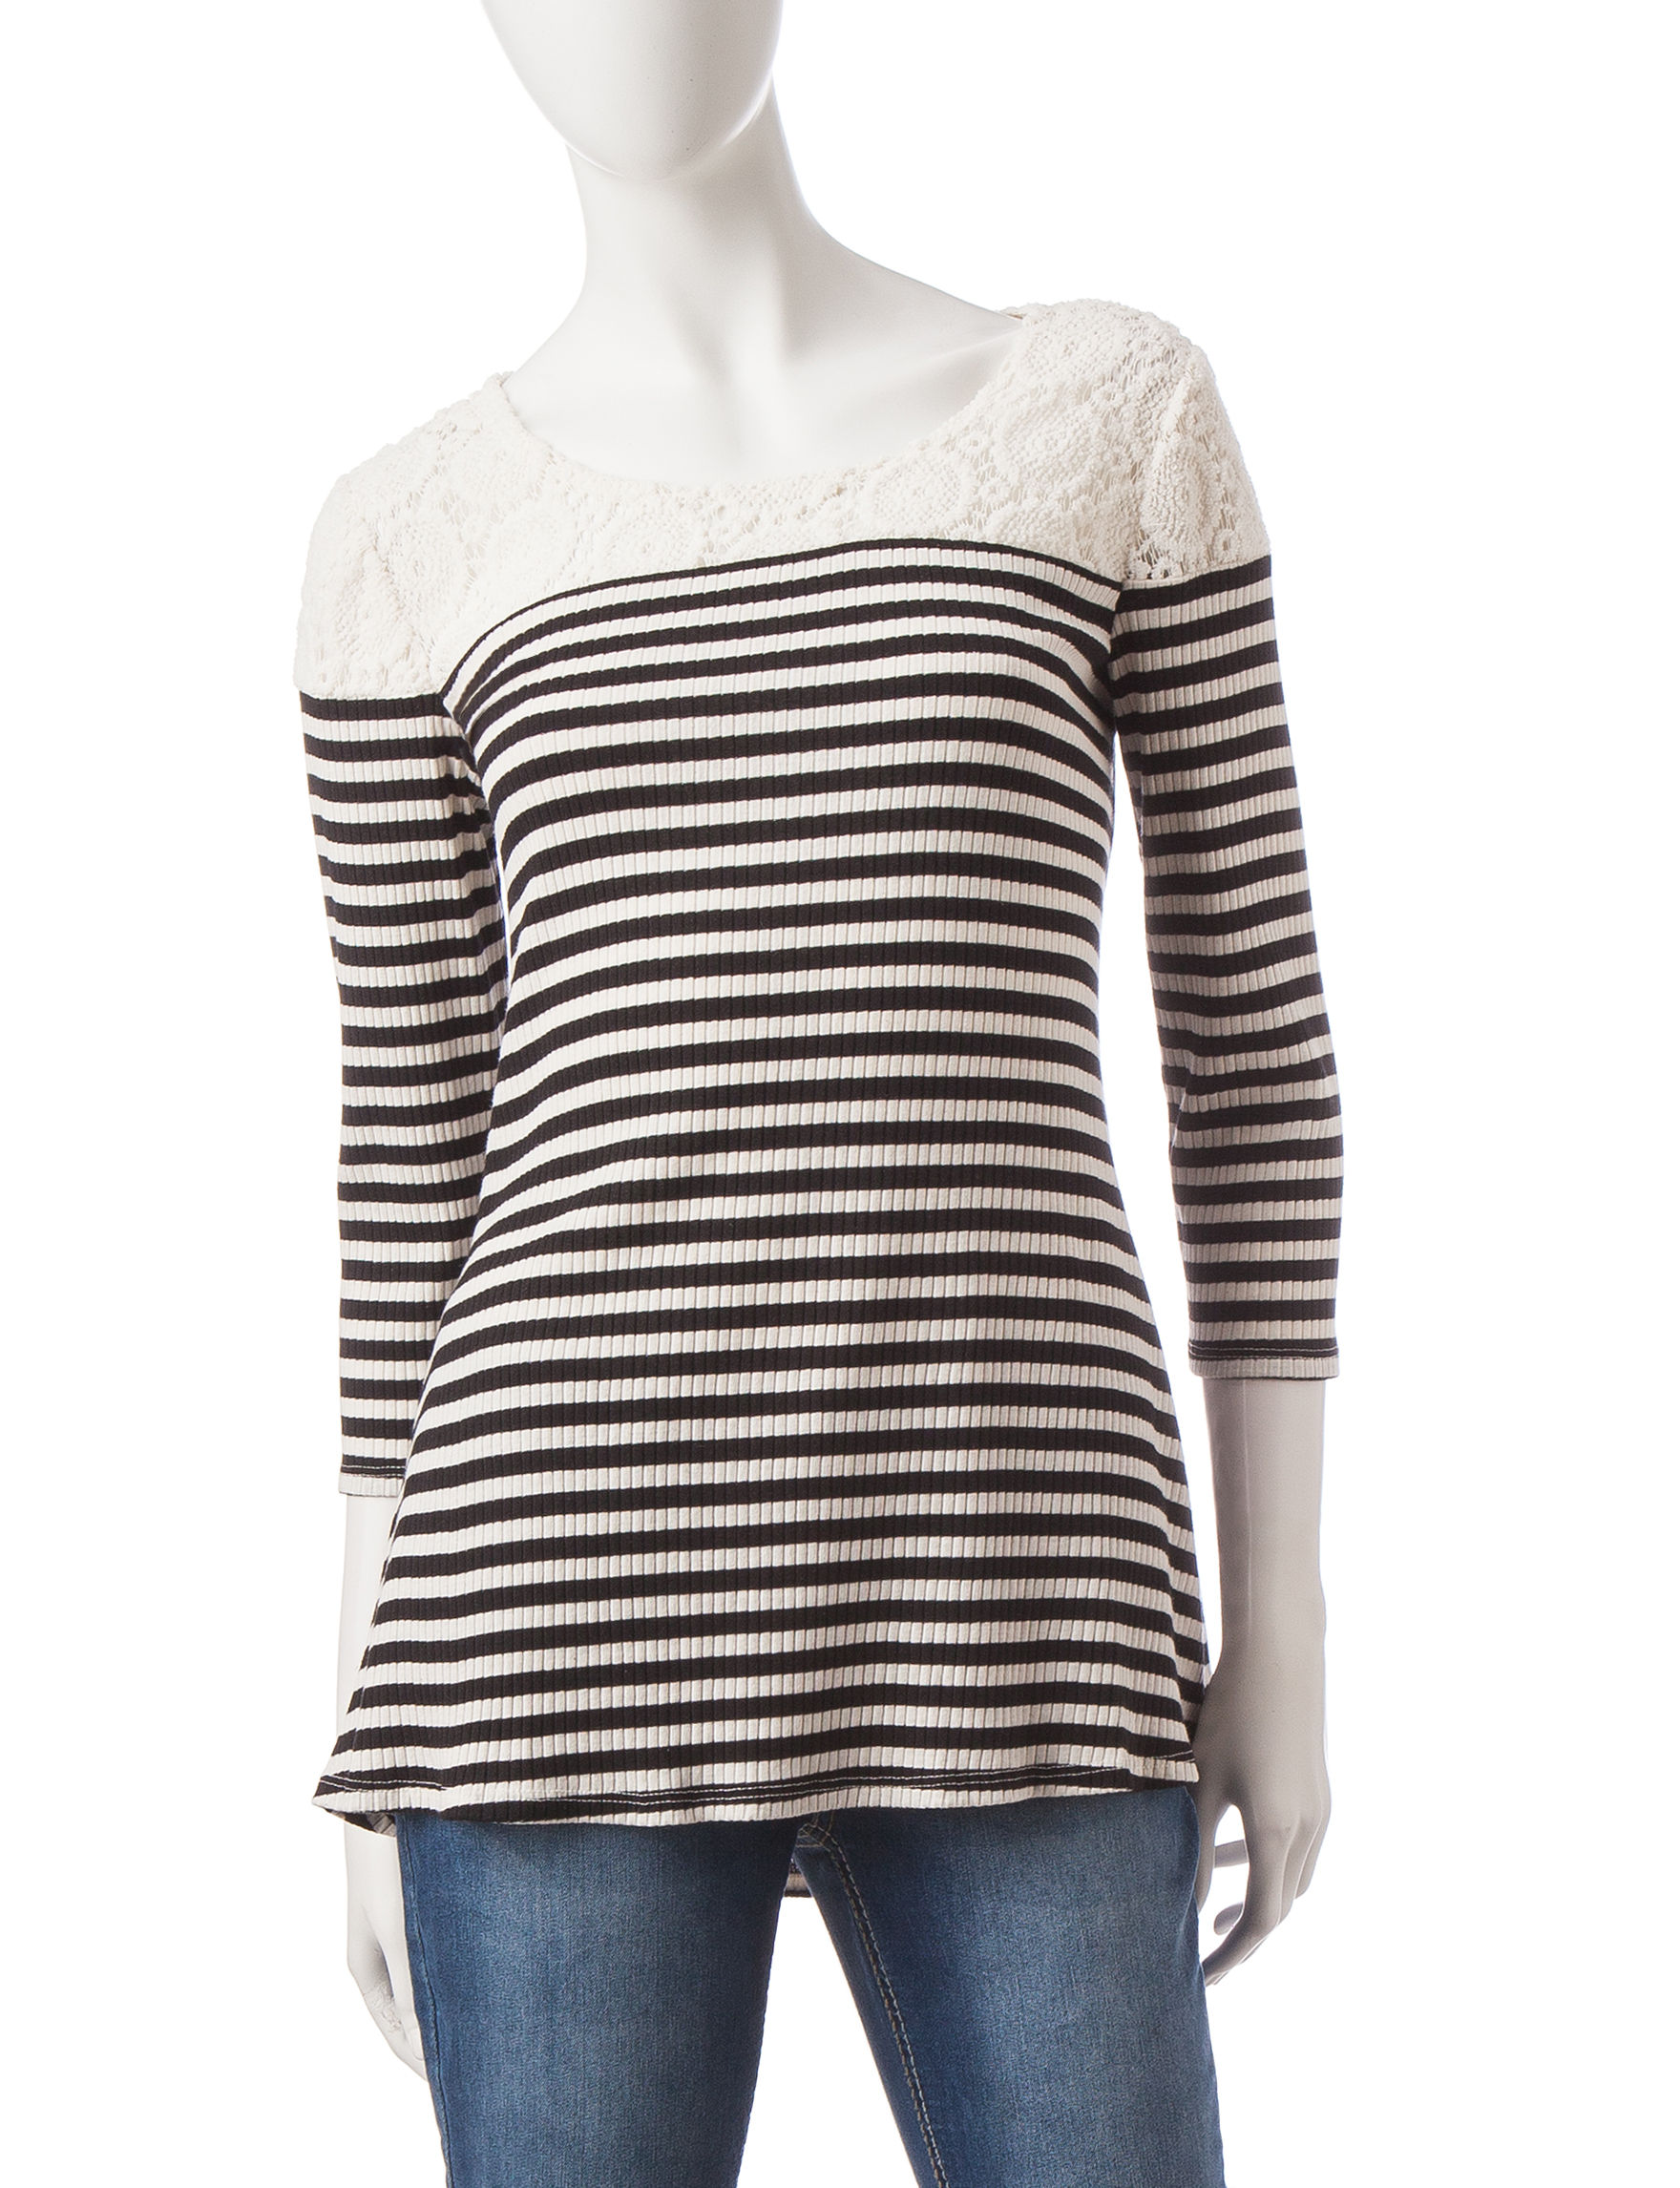 Hannah Navy / Ivory Shirts & Blouses